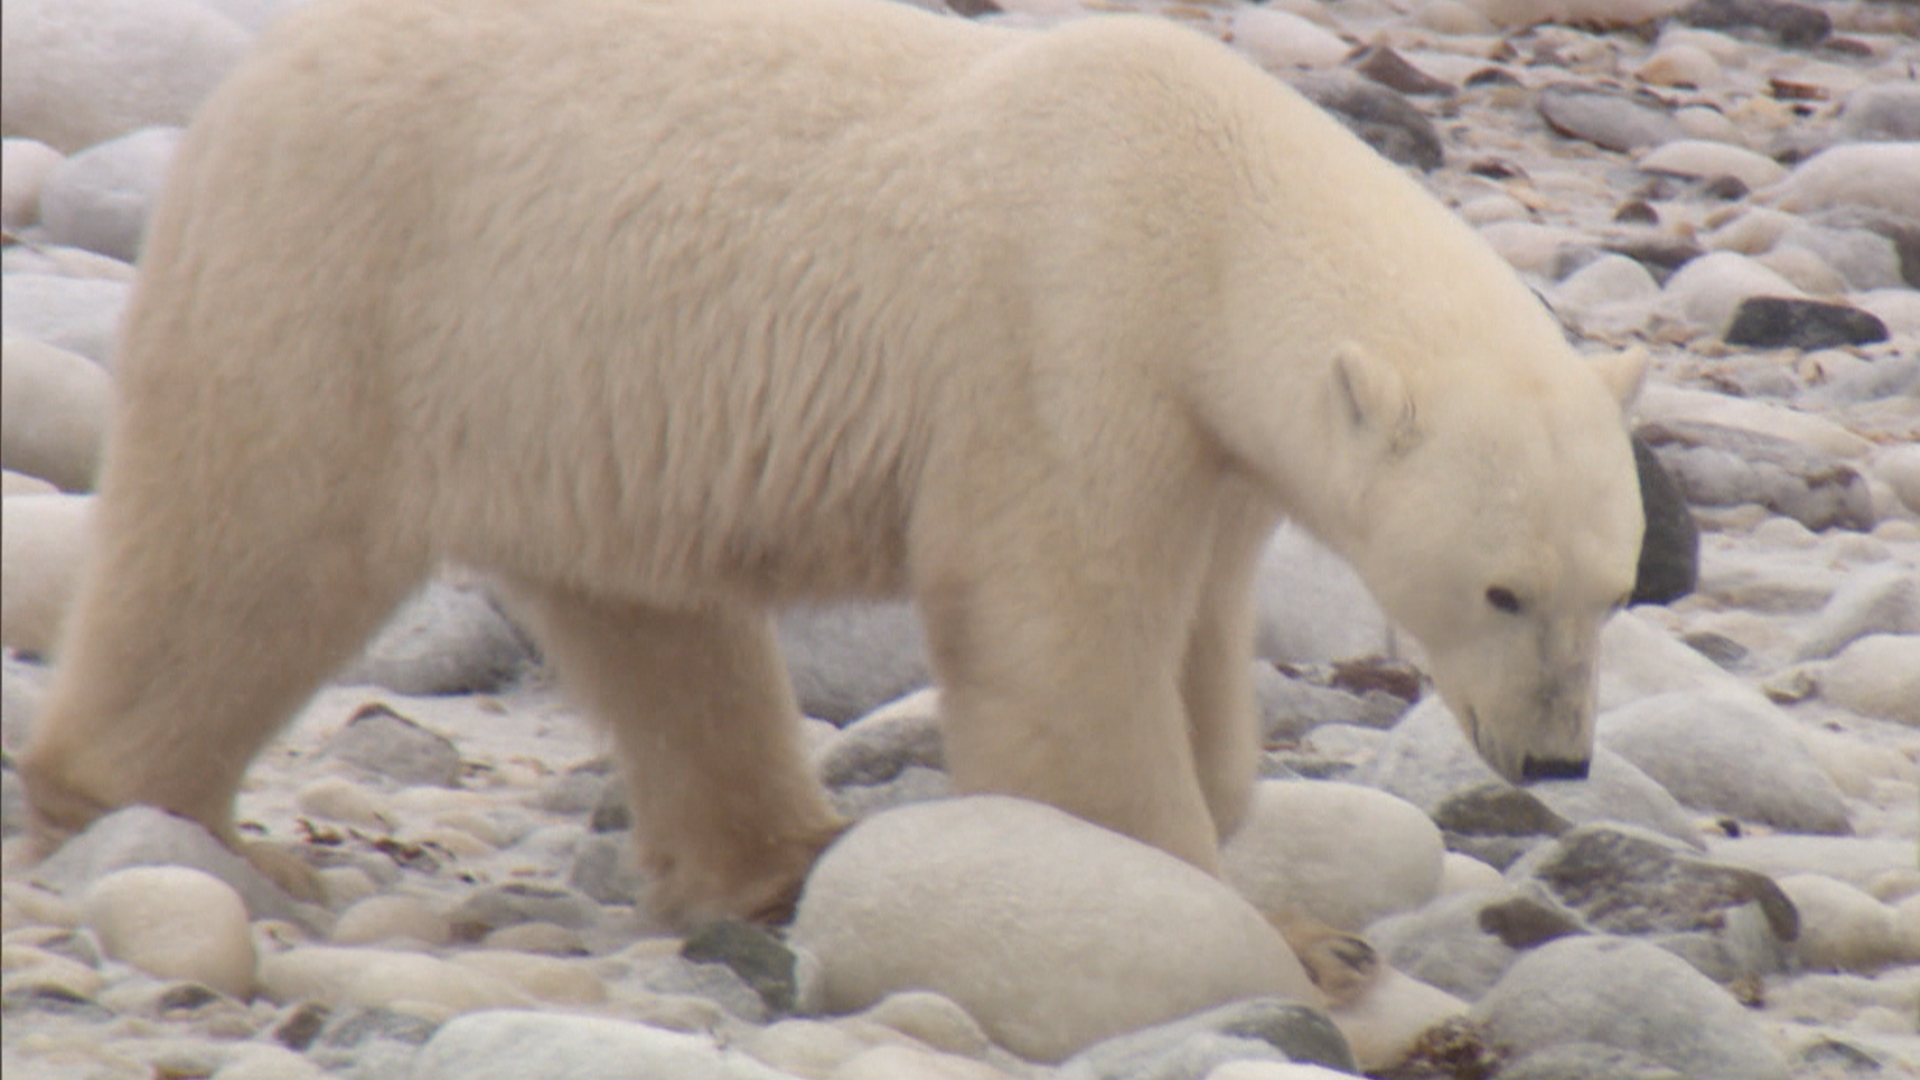 Drawn polar  bear skinny NBC Climate Change Don't Just